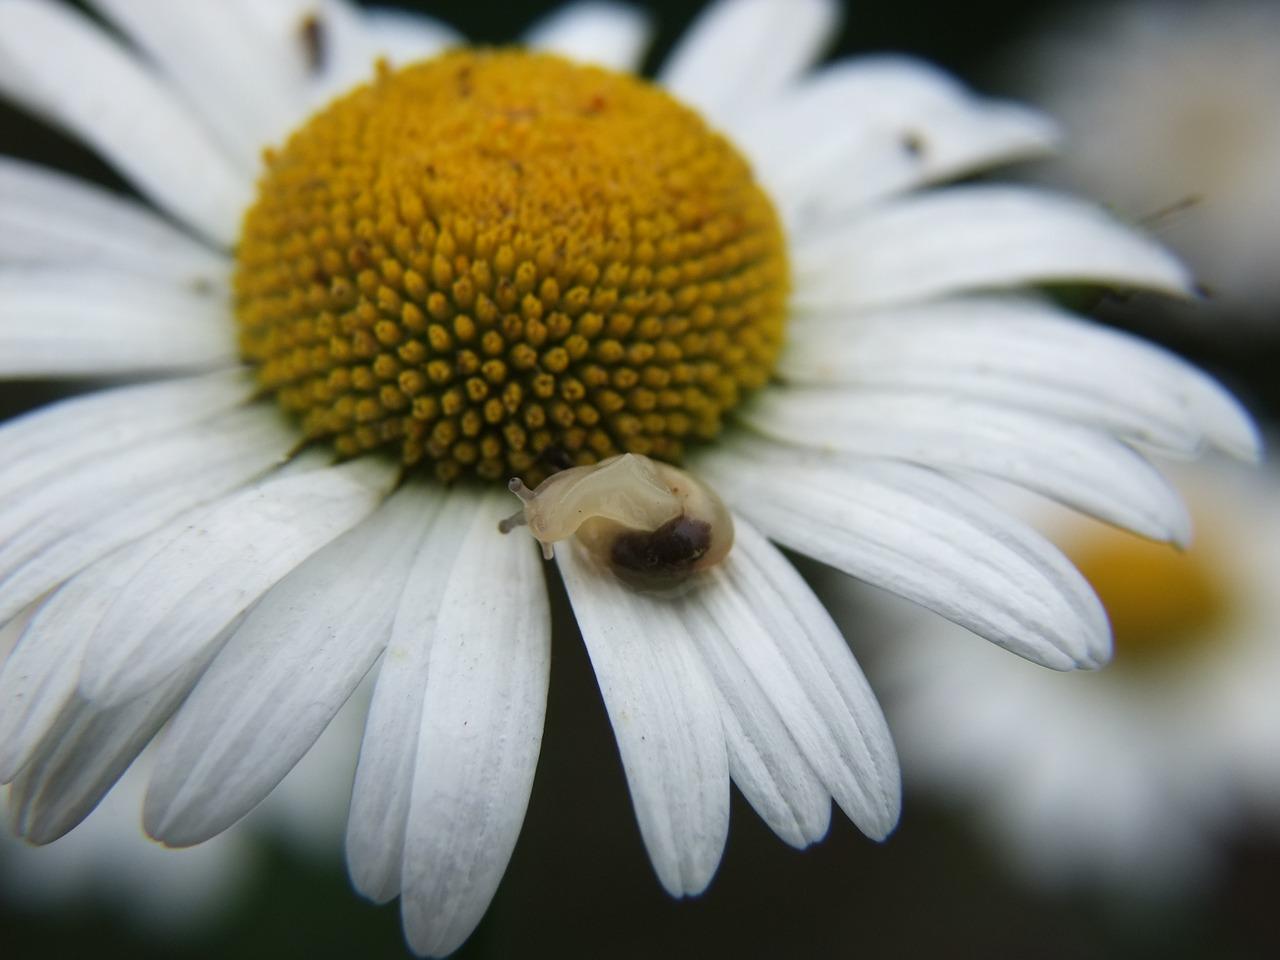 Daisysnaildancing free photo from needpix daisy snail dancing izmirmasajfo